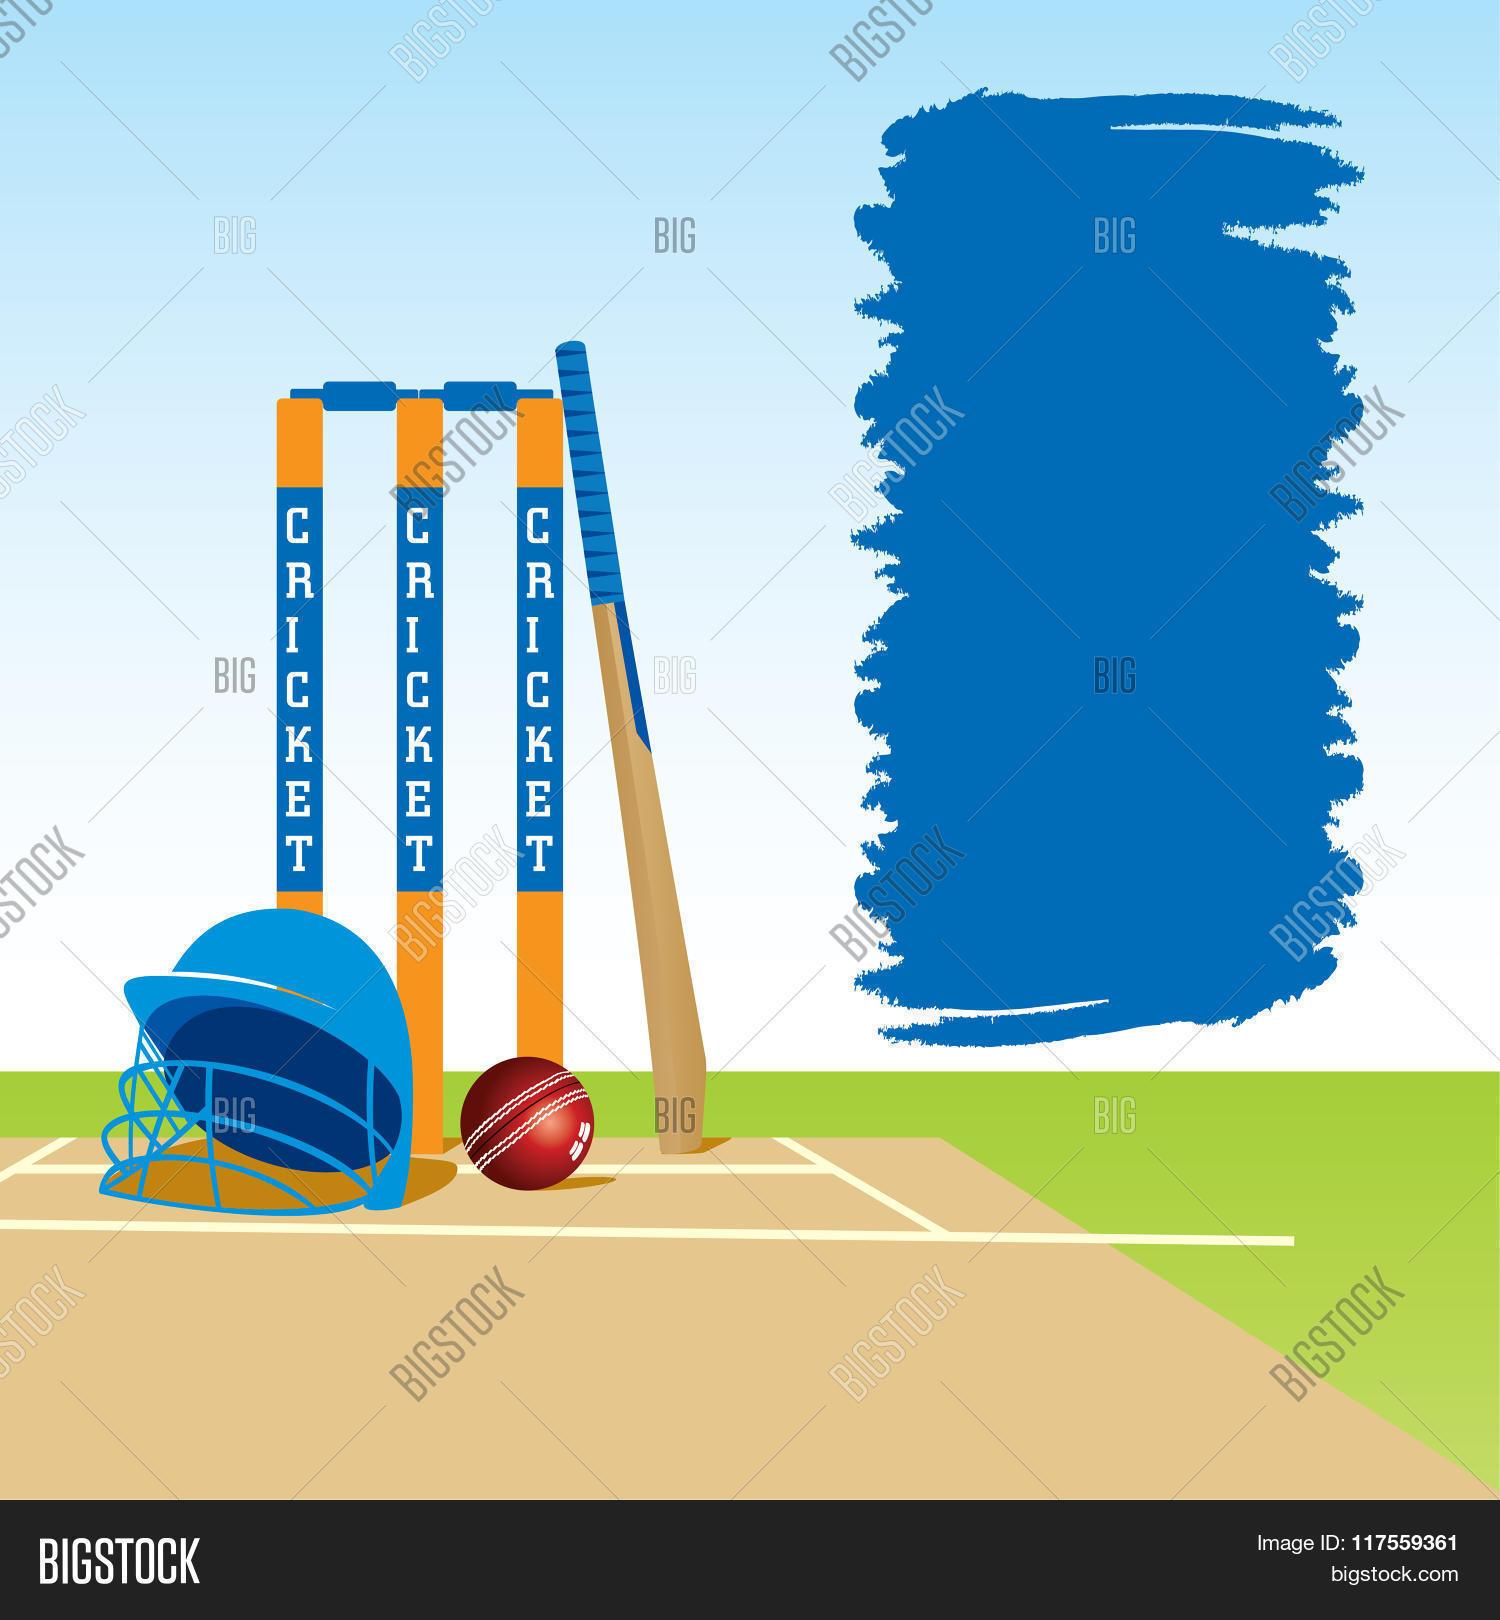 Creative Cricket Banner Design